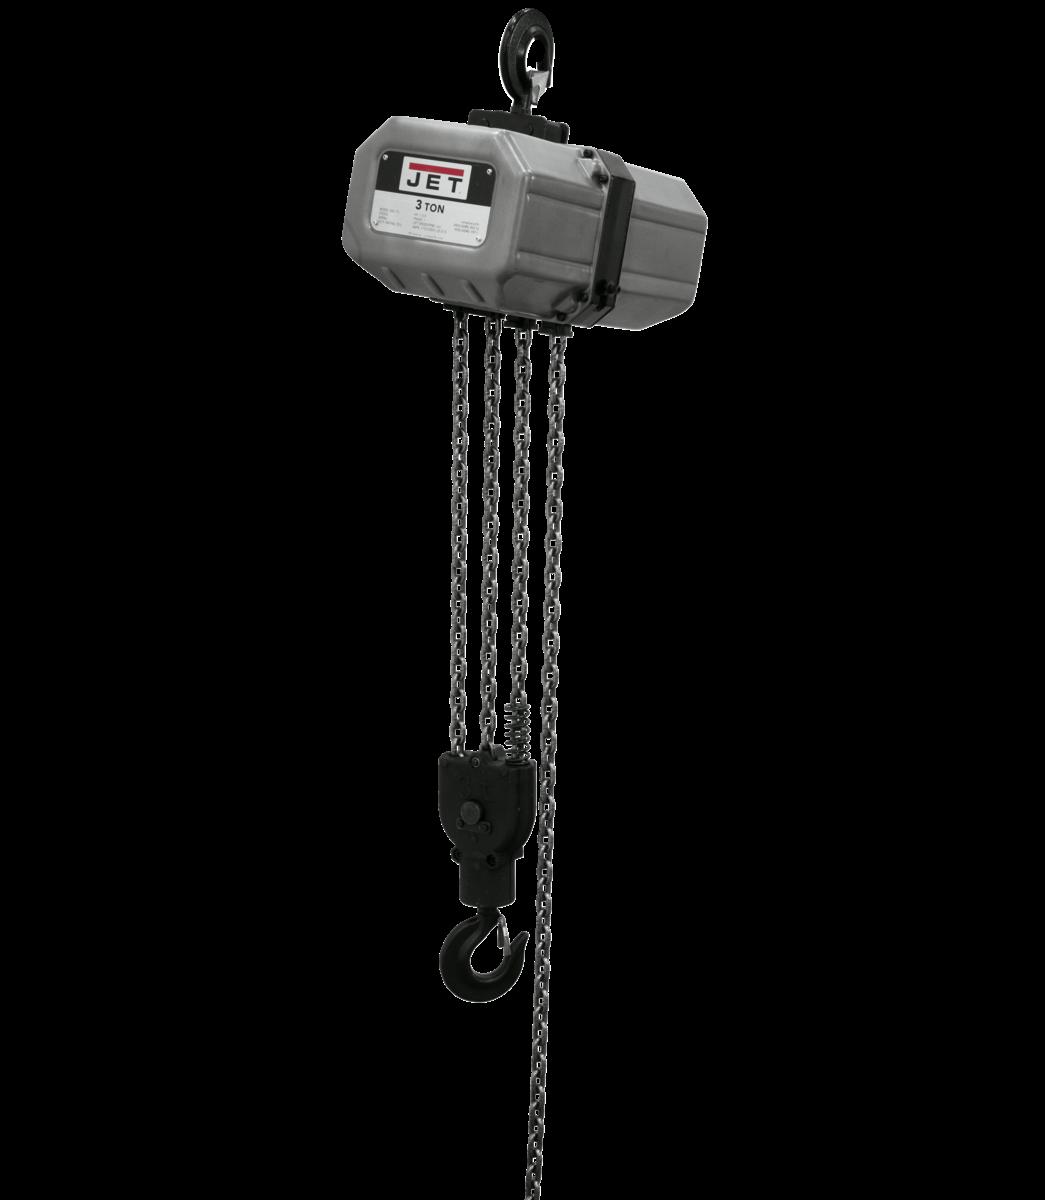 3SS-1C-20, 3-Ton Electric Chain Hoist 1-Phase 20' Lift